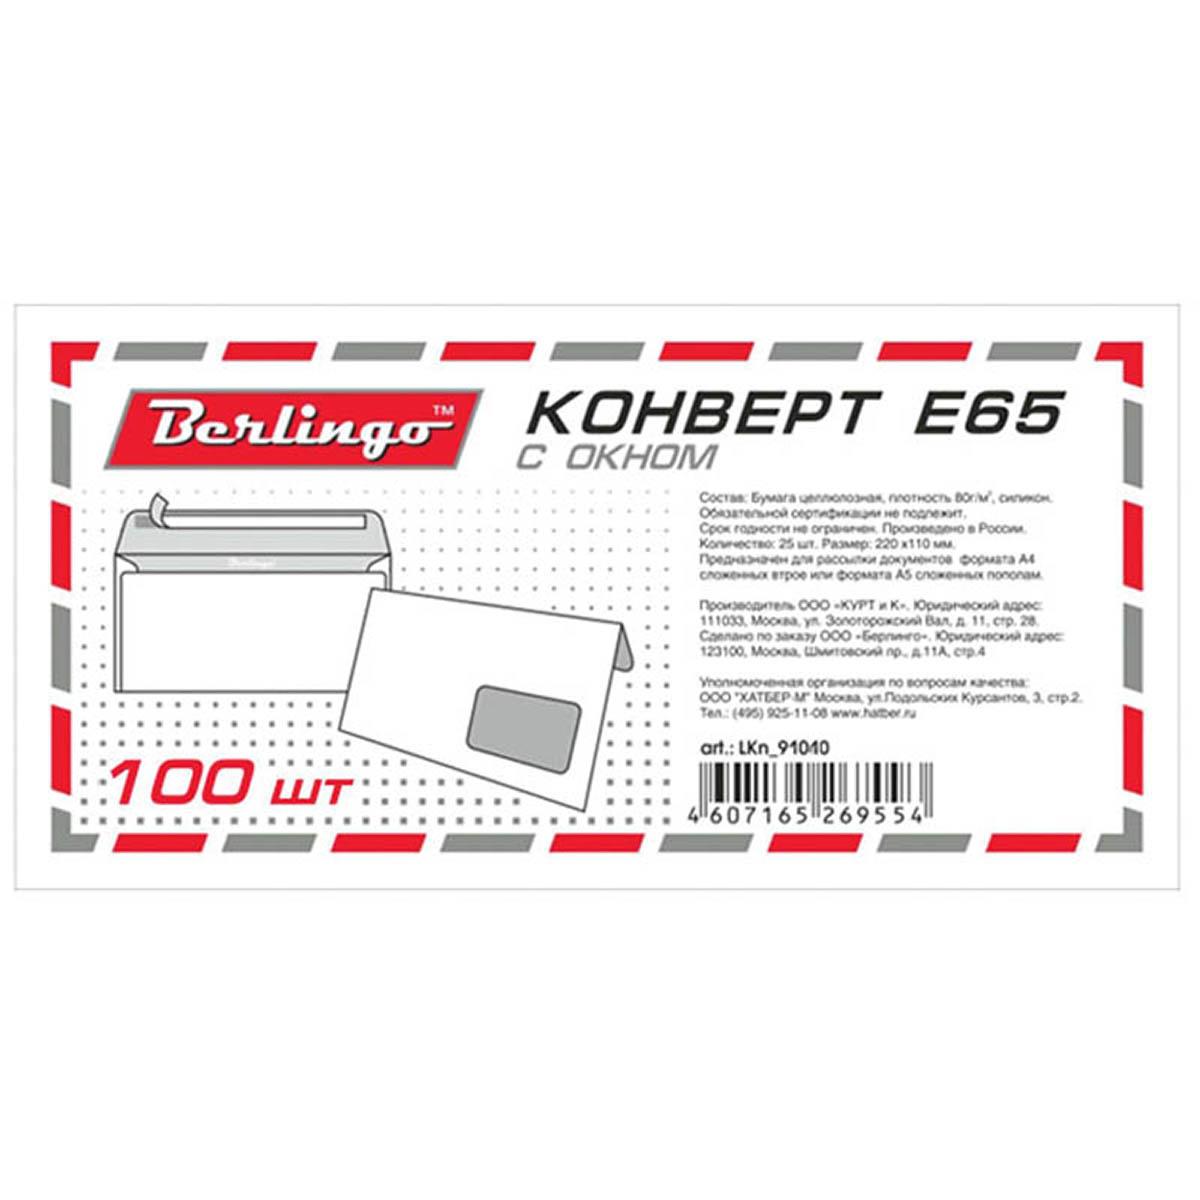 Конверт E65 100 шт LKn_91010